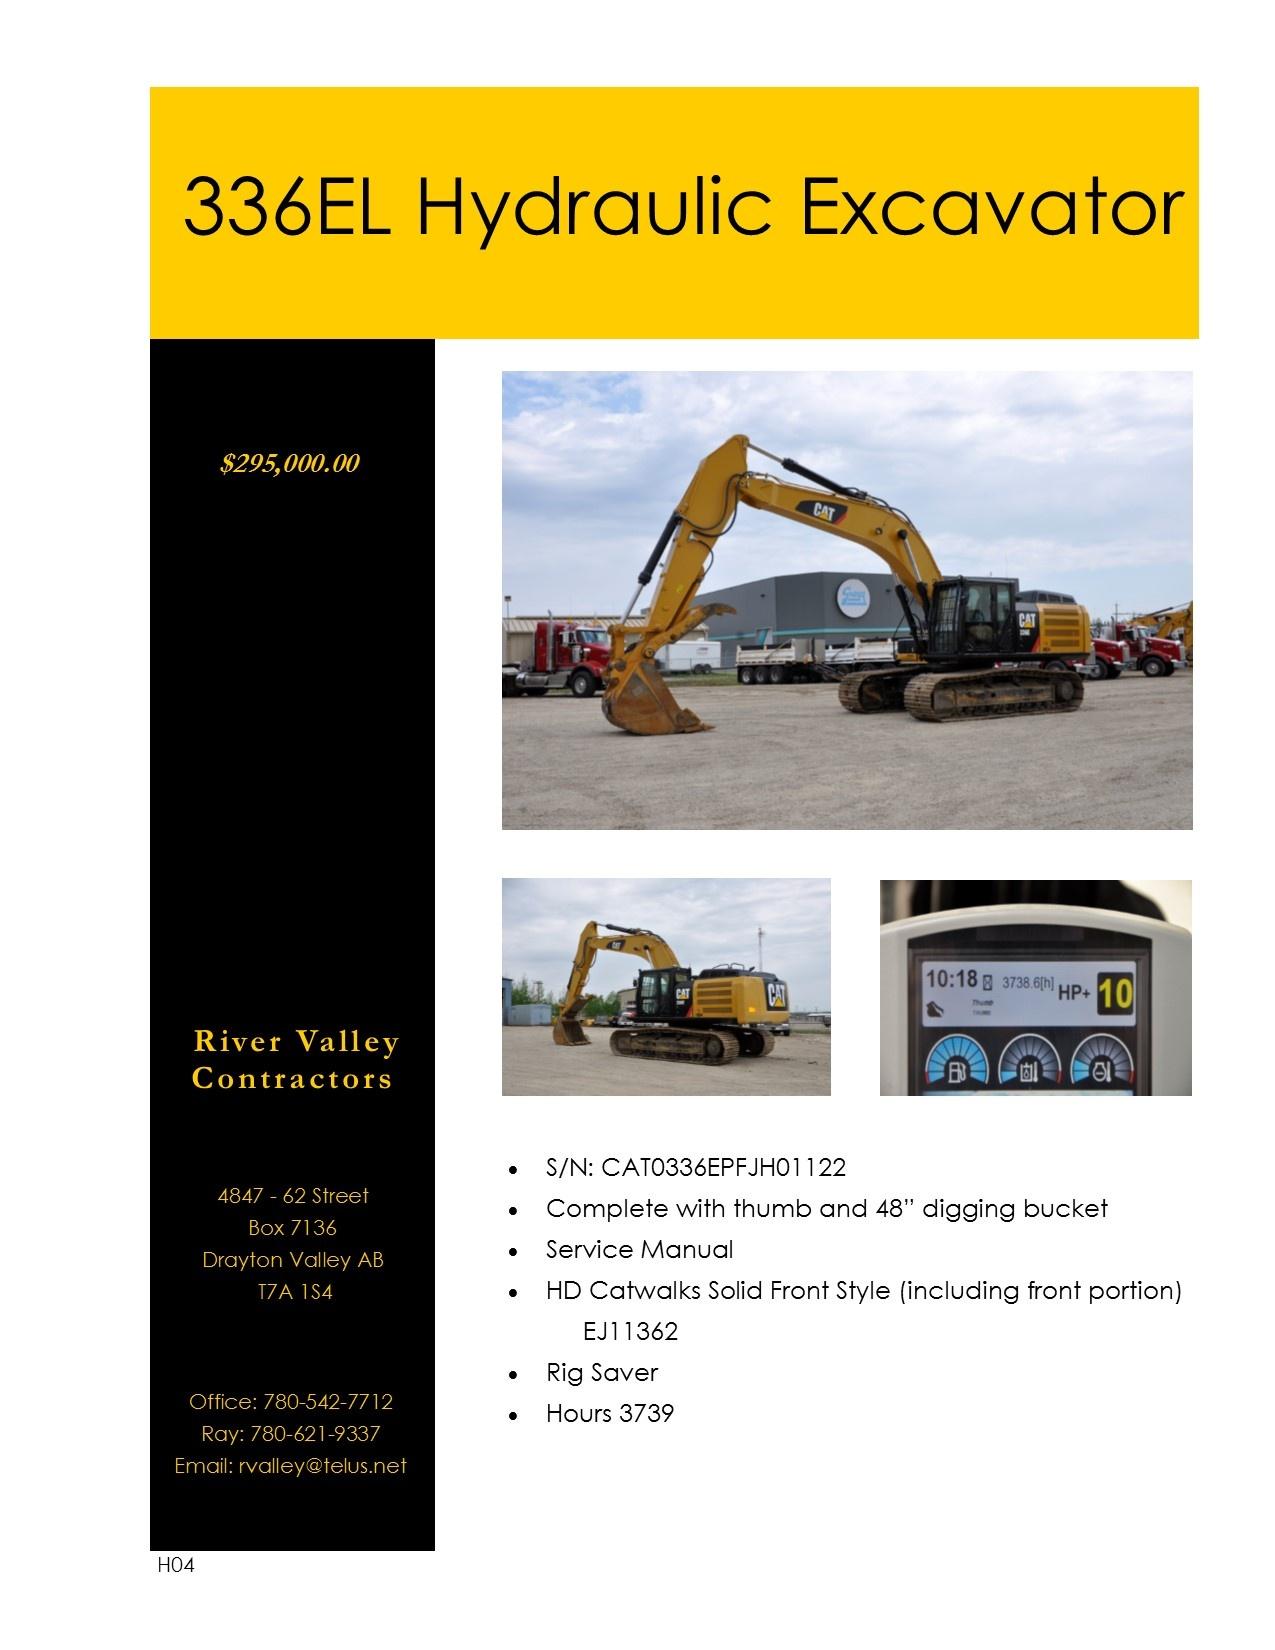 https://0901.nccdn.net/4_2/000/000/038/2d3/H04-336EL-Hydraulic-Excavator-1275x1650.jpg